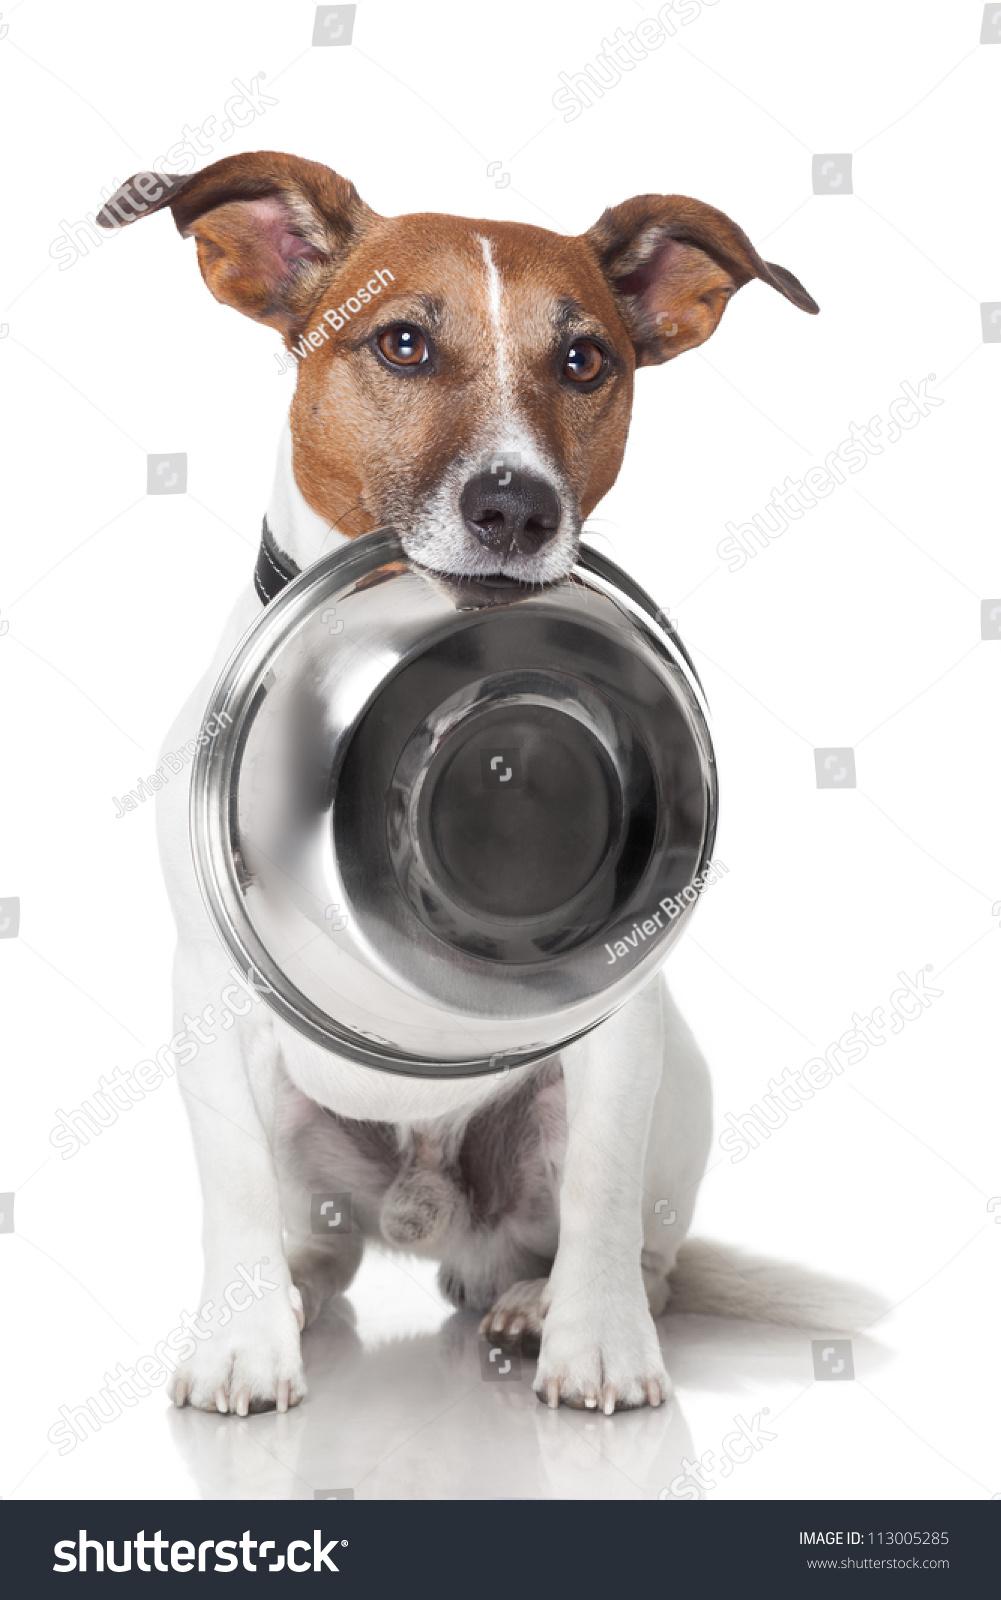 Dog Guarding Food Bowl